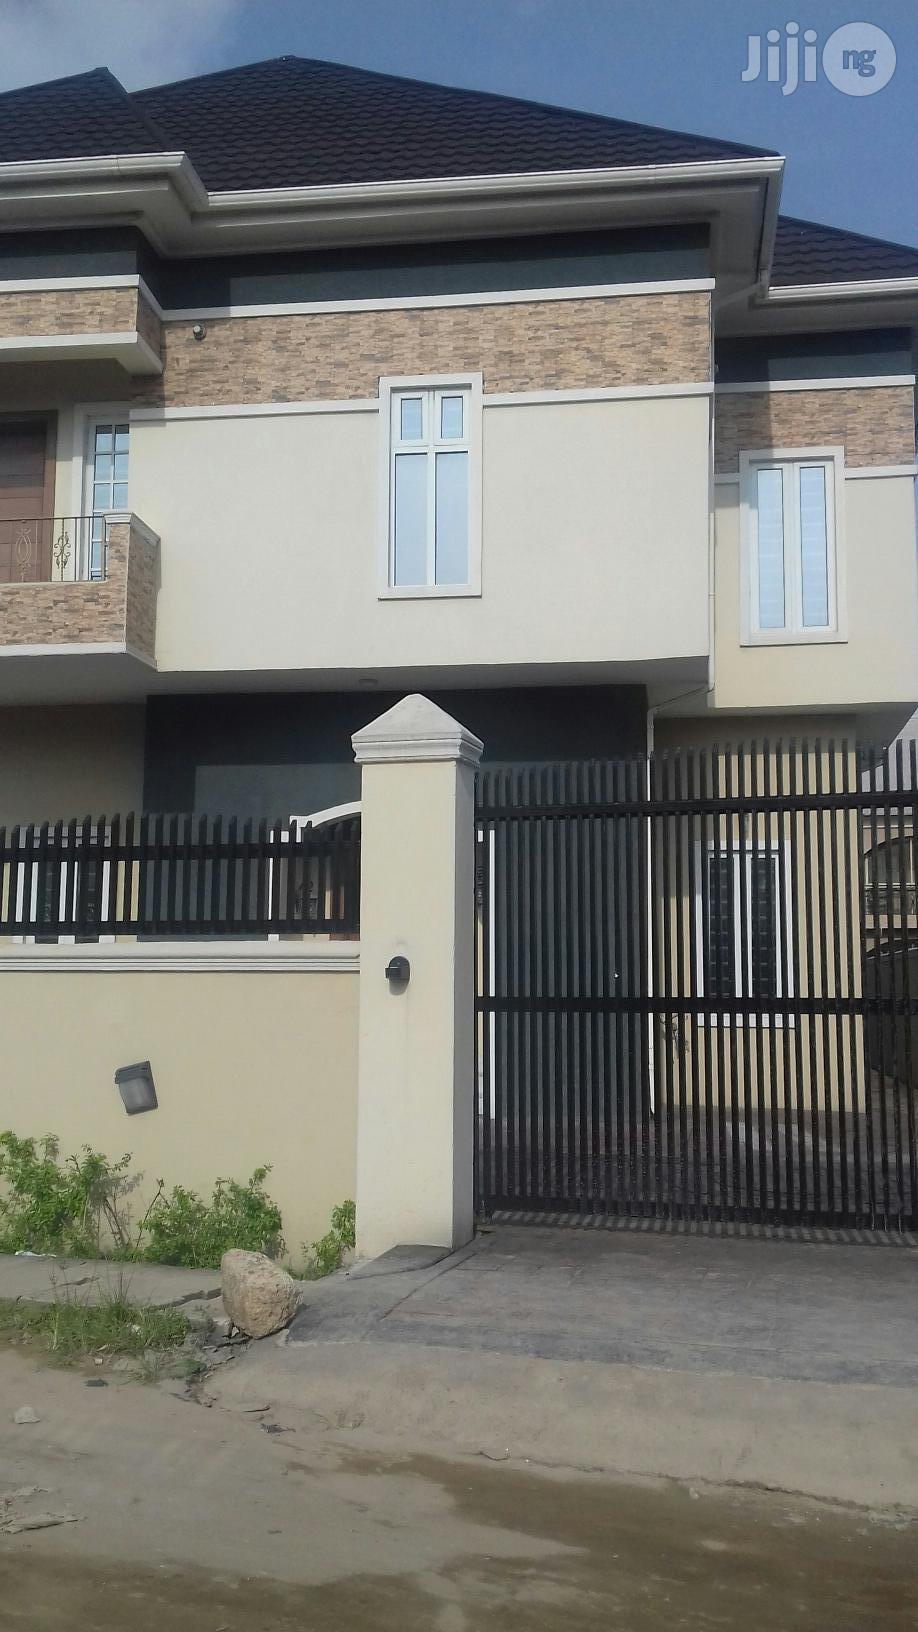 C of O,5 Bedroom Duplex, Lakeview Estate Amuwo-Odofin